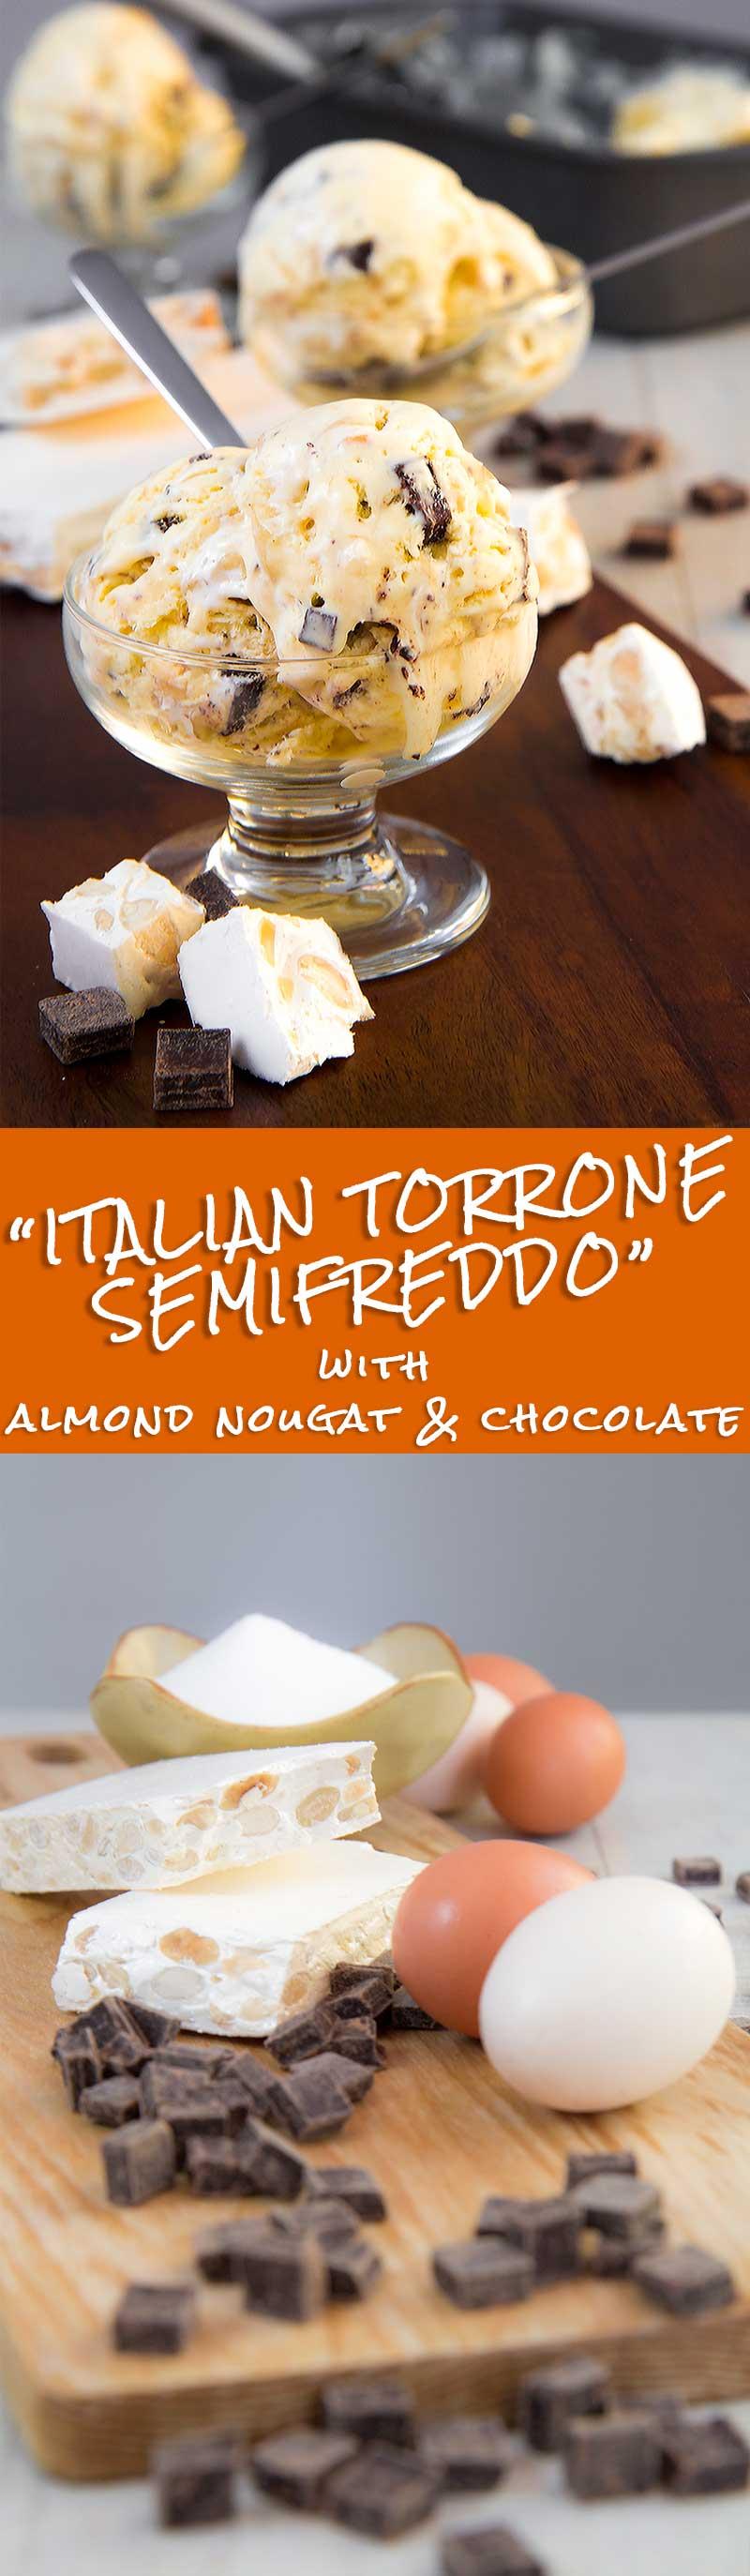 ITALIAN TORRONE SEMIFREDDO with chocolate chunks